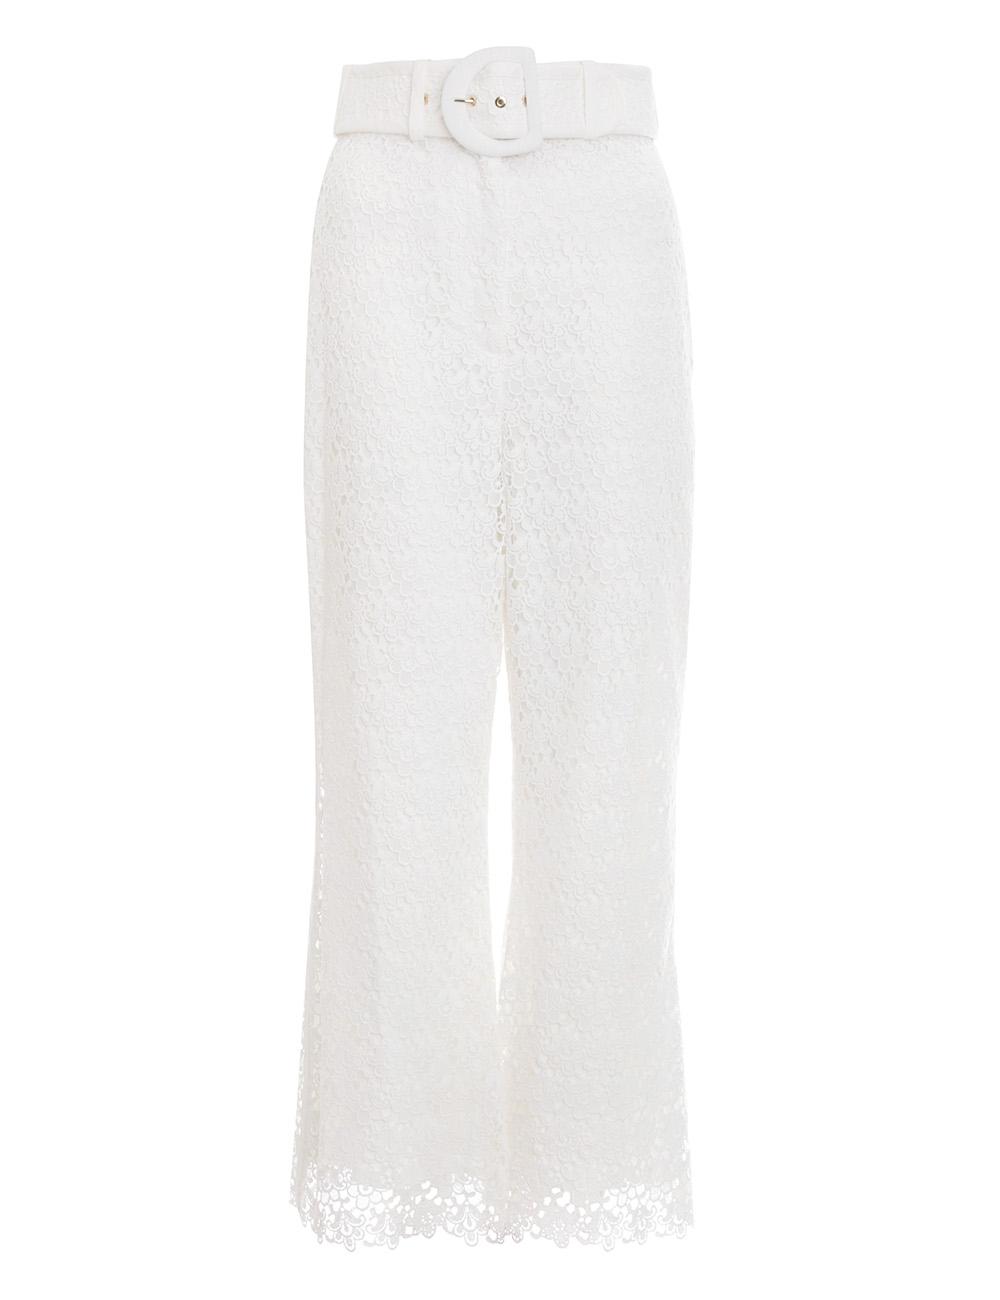 Super Eight Lace Pant